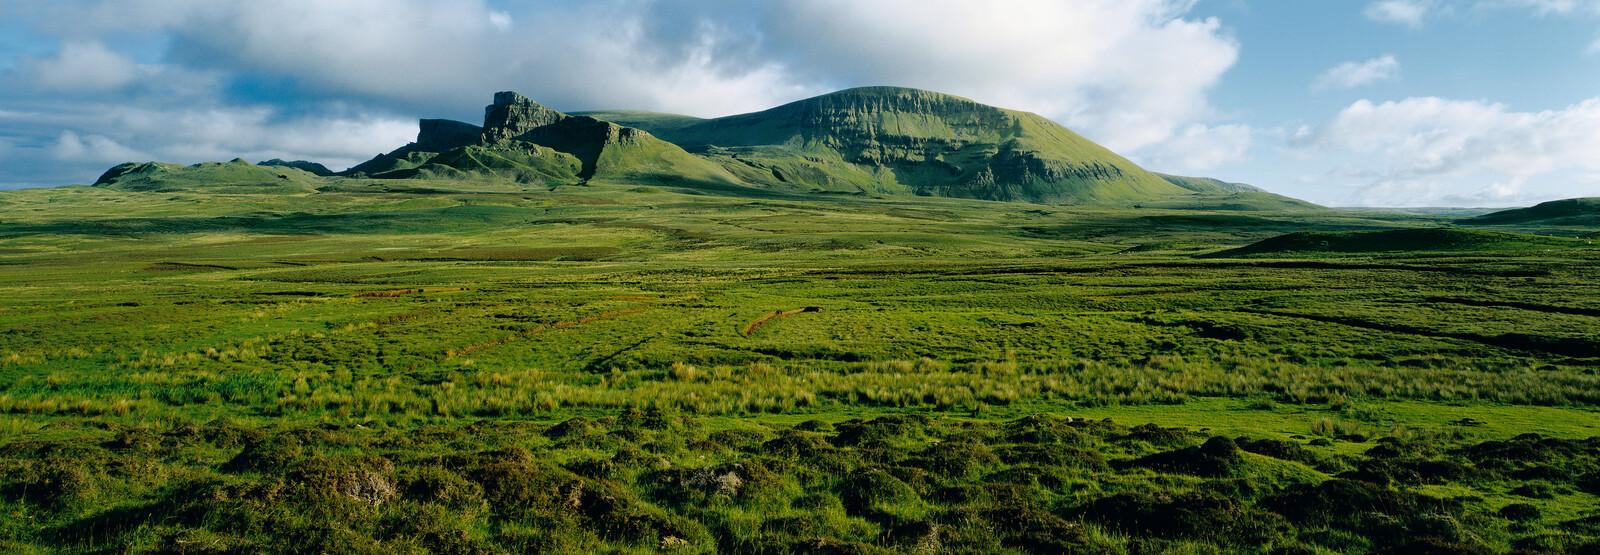 Quiraing, Isle of Skye, Inner Hebrides, Scotland - Axel M. Mosler